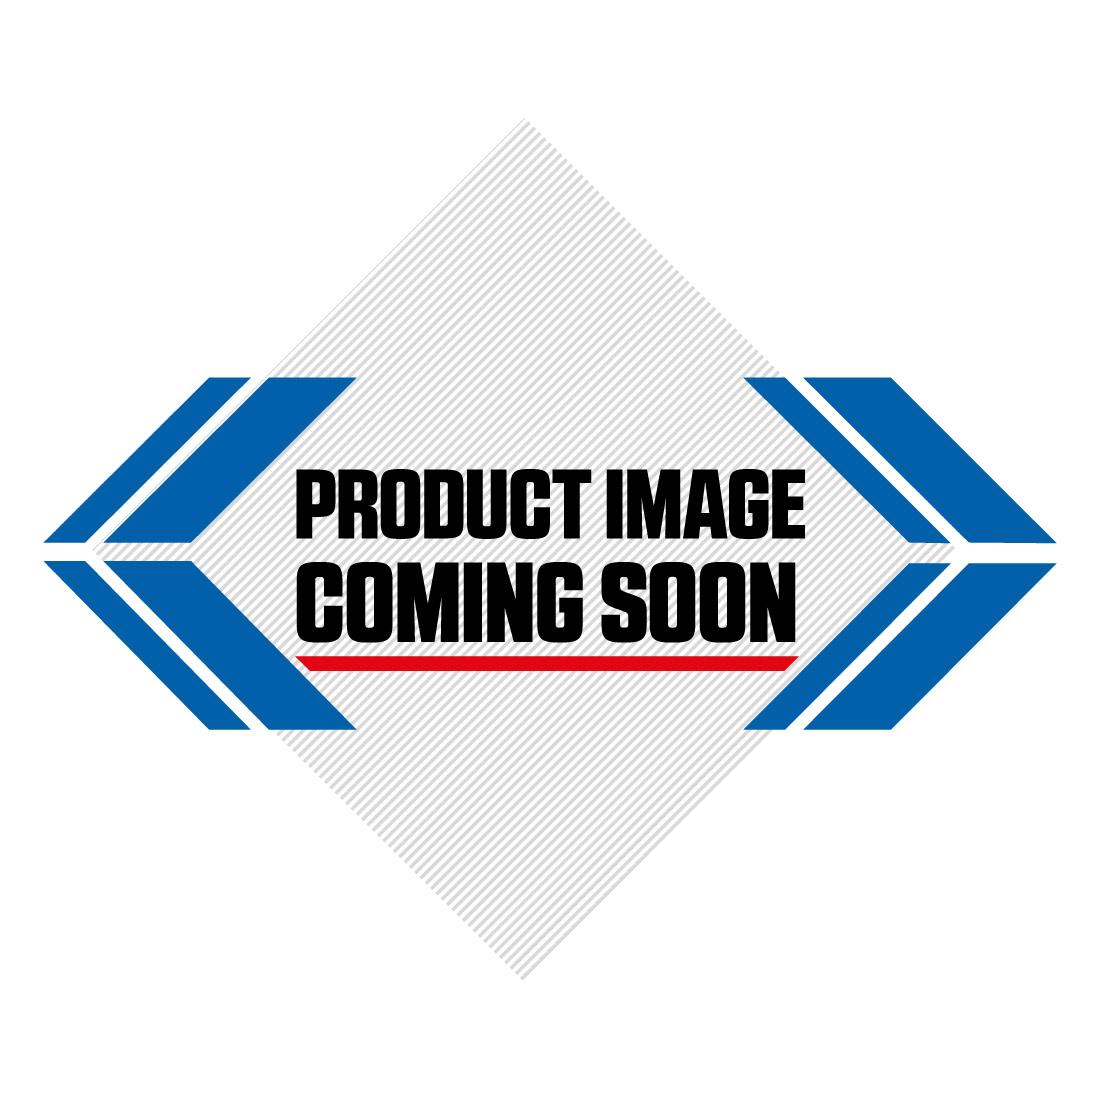 Renthal Twinring Rear Sprocket KTM SX SX-F EXC EXC-F Husqvarna TC FC TE FE - Orange Image-3